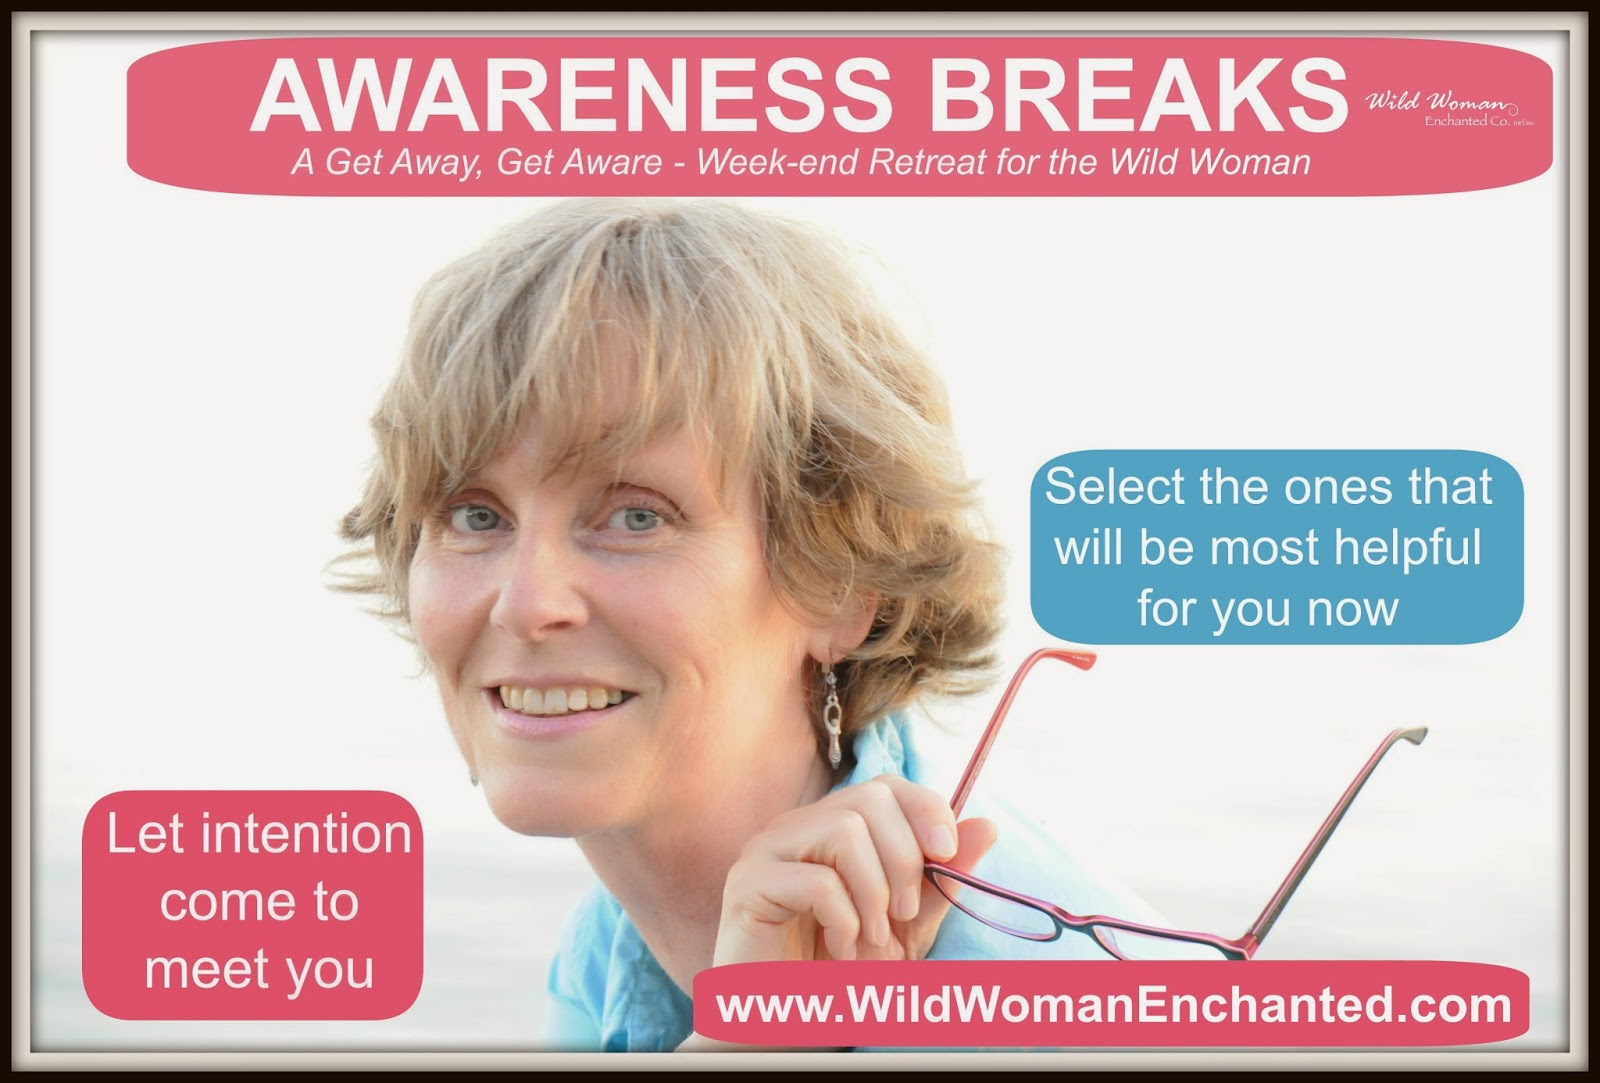 http://shop.wildwomanenchanted.com/category-s/47.htm